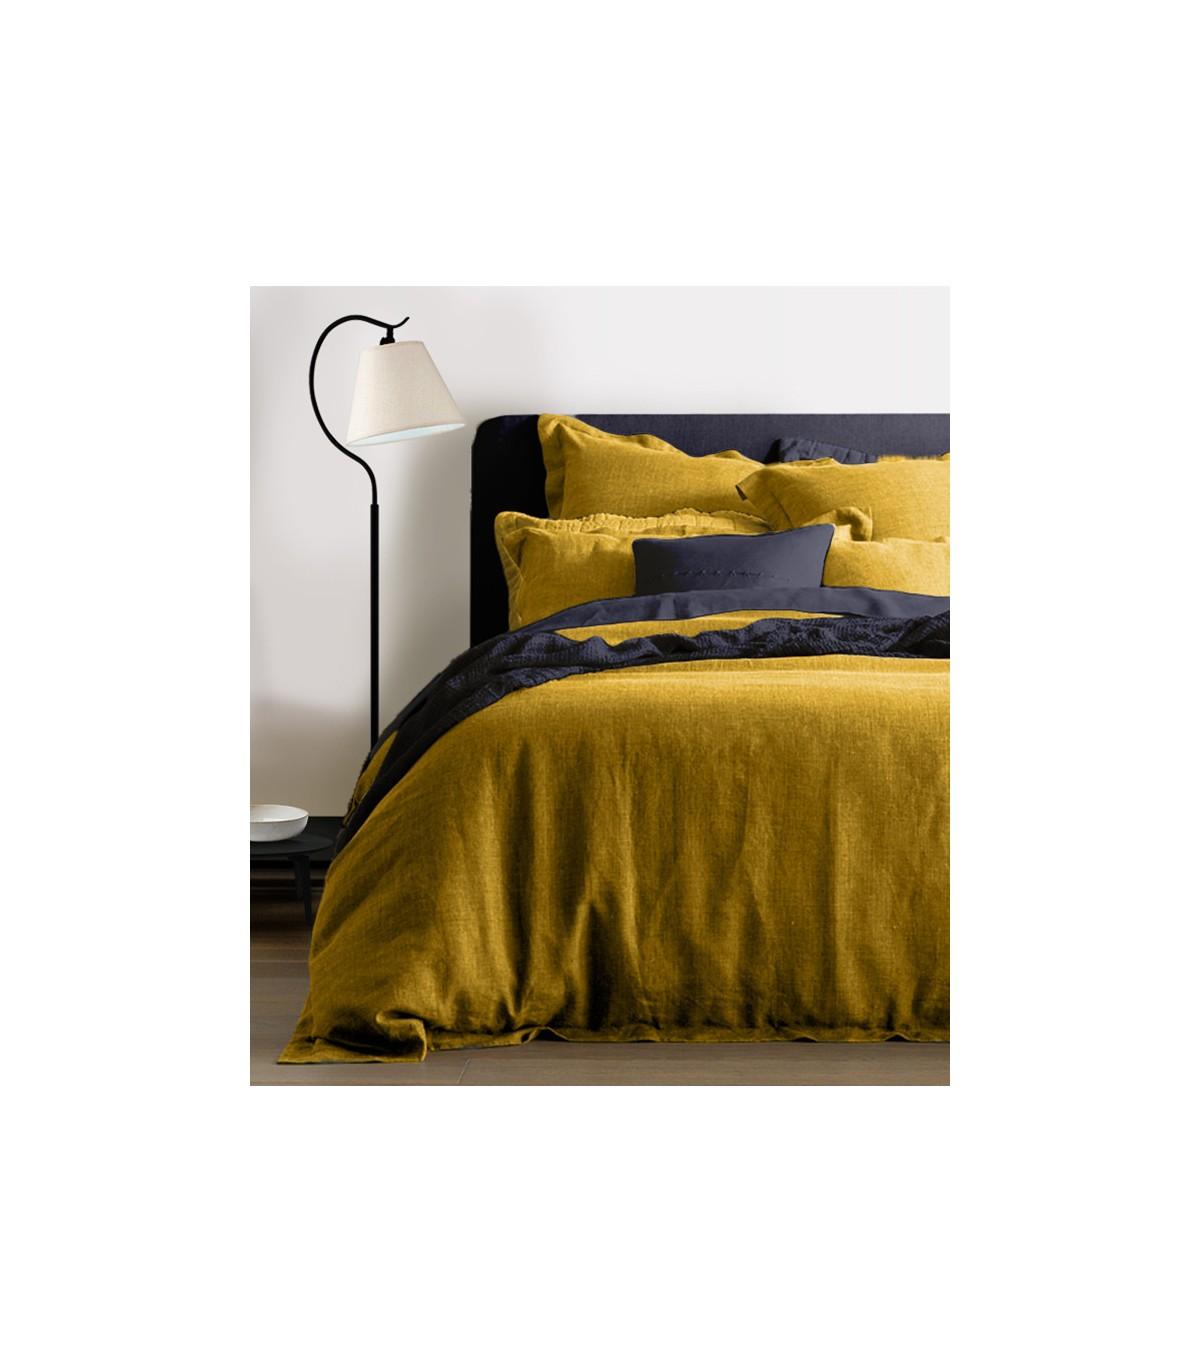 housse de couette  100 lin  jaune moutarde  my little bed